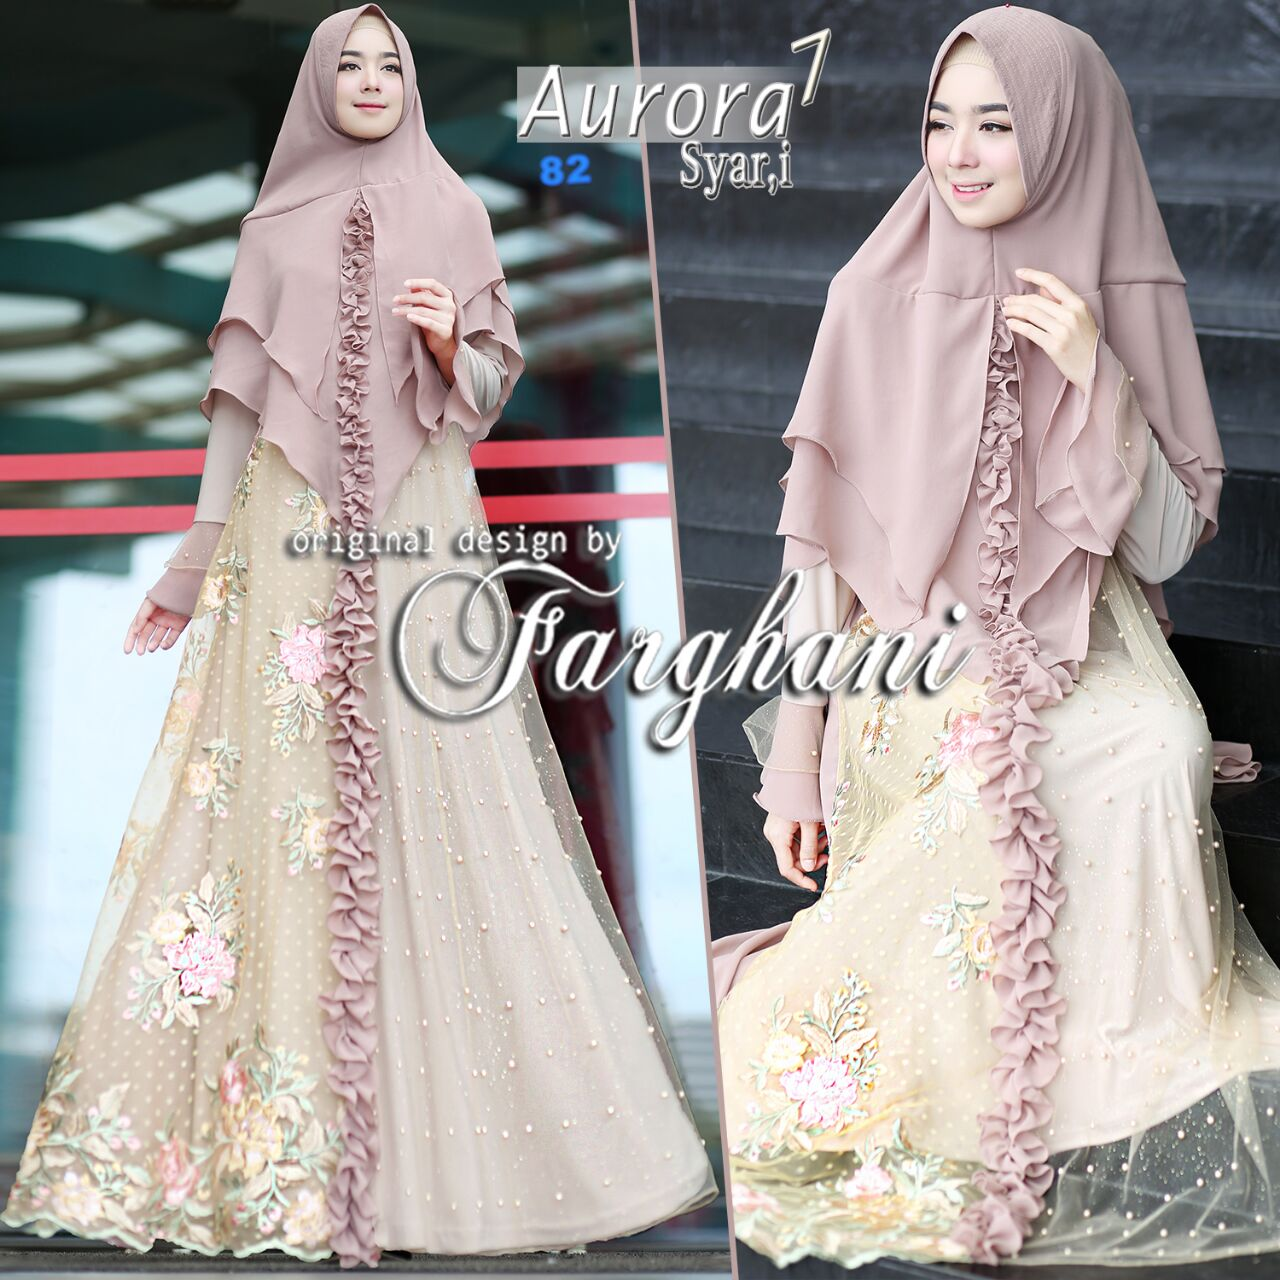 Aurora Long Skirt Warna Abu Daftar Harga Terkini Dan My Size Pants Pencil Abuaz492 Muda 3l 7 By Farghani